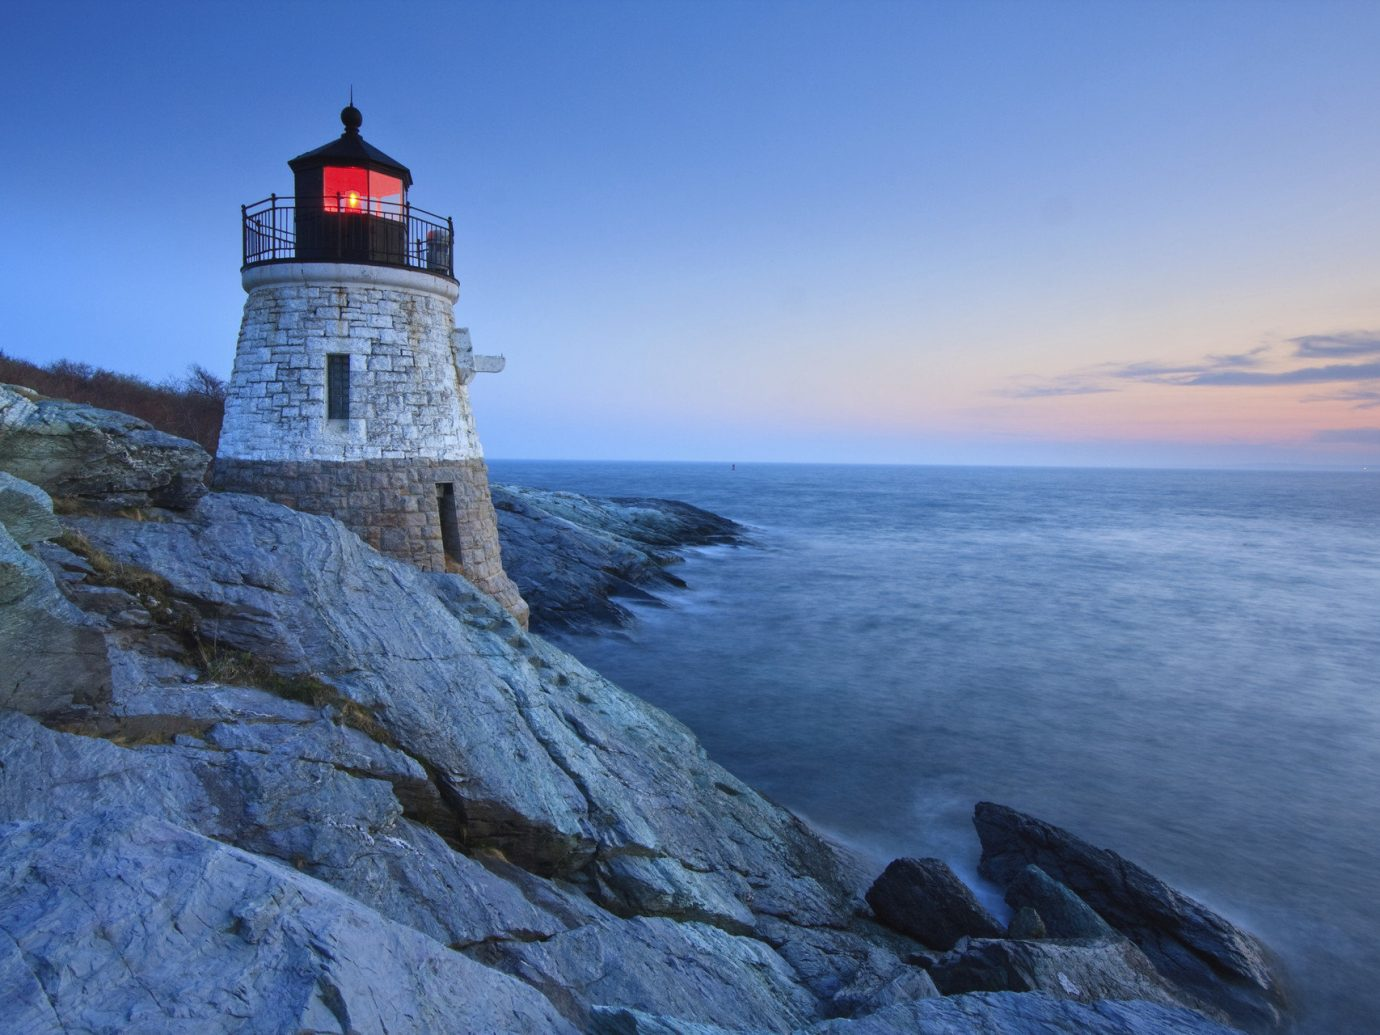 Travel Tips Trip Ideas sky outdoor water lighthouse tower rock Sea Coast Nature Ocean cliff cape terrain